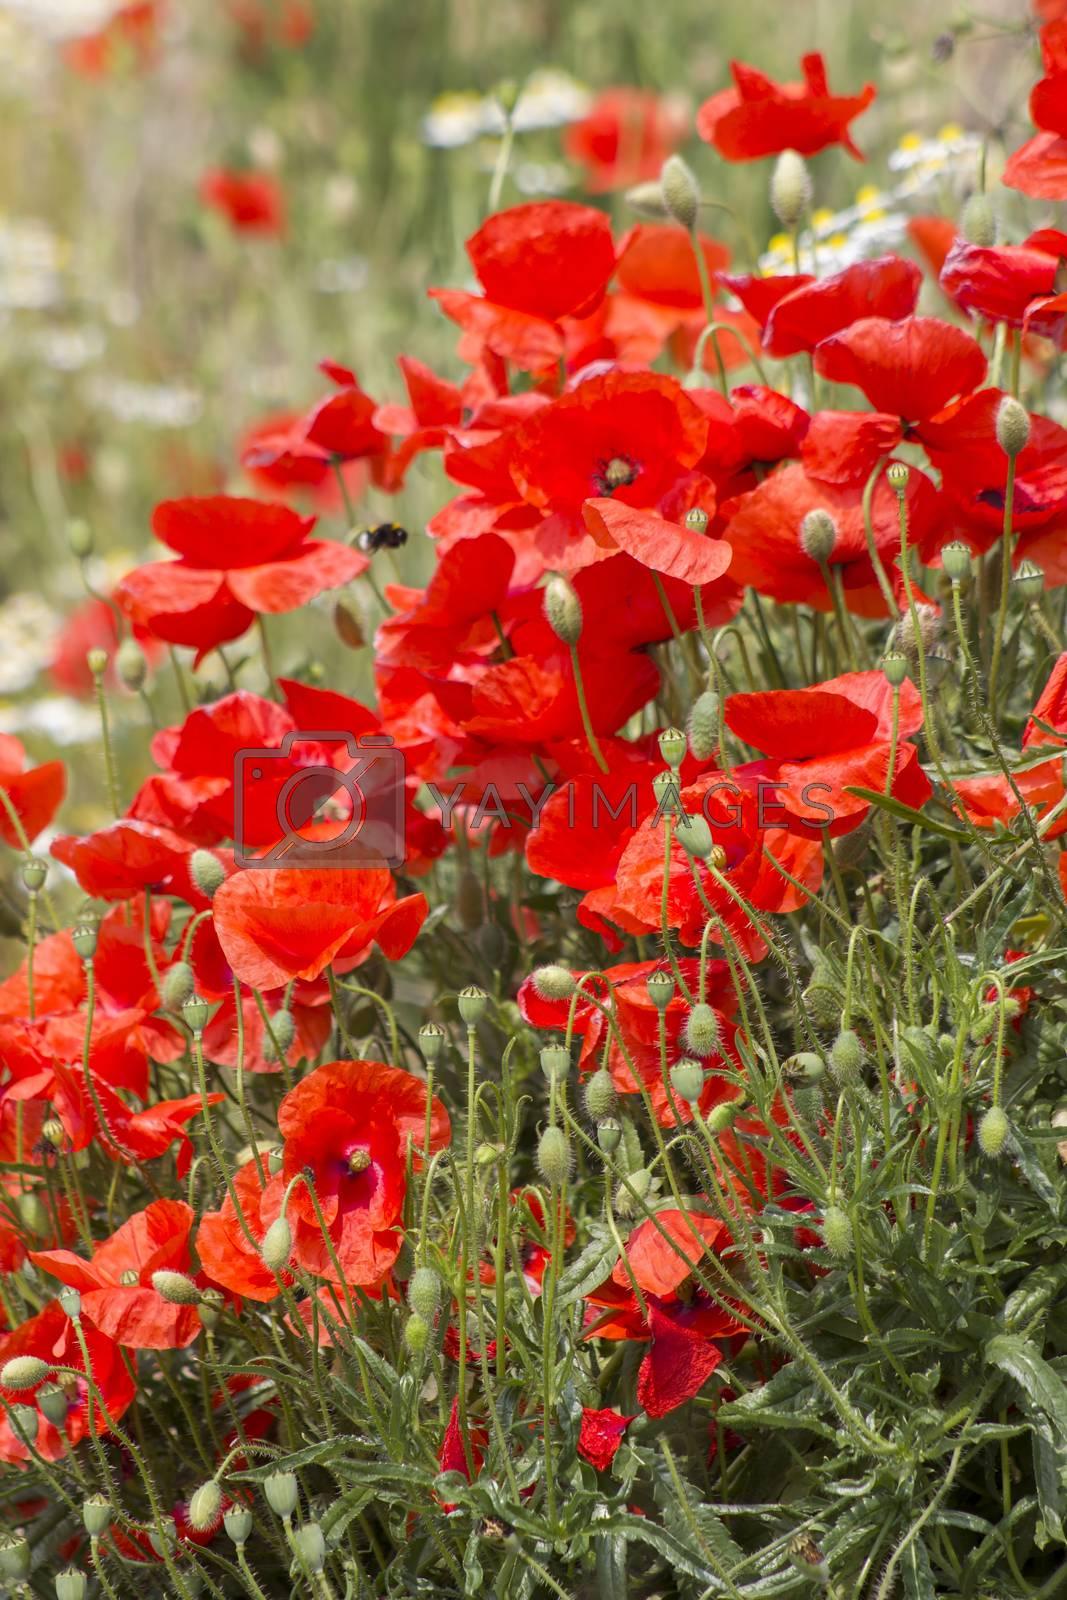 Royalty free image of wild poppy flowers by miradrozdowski